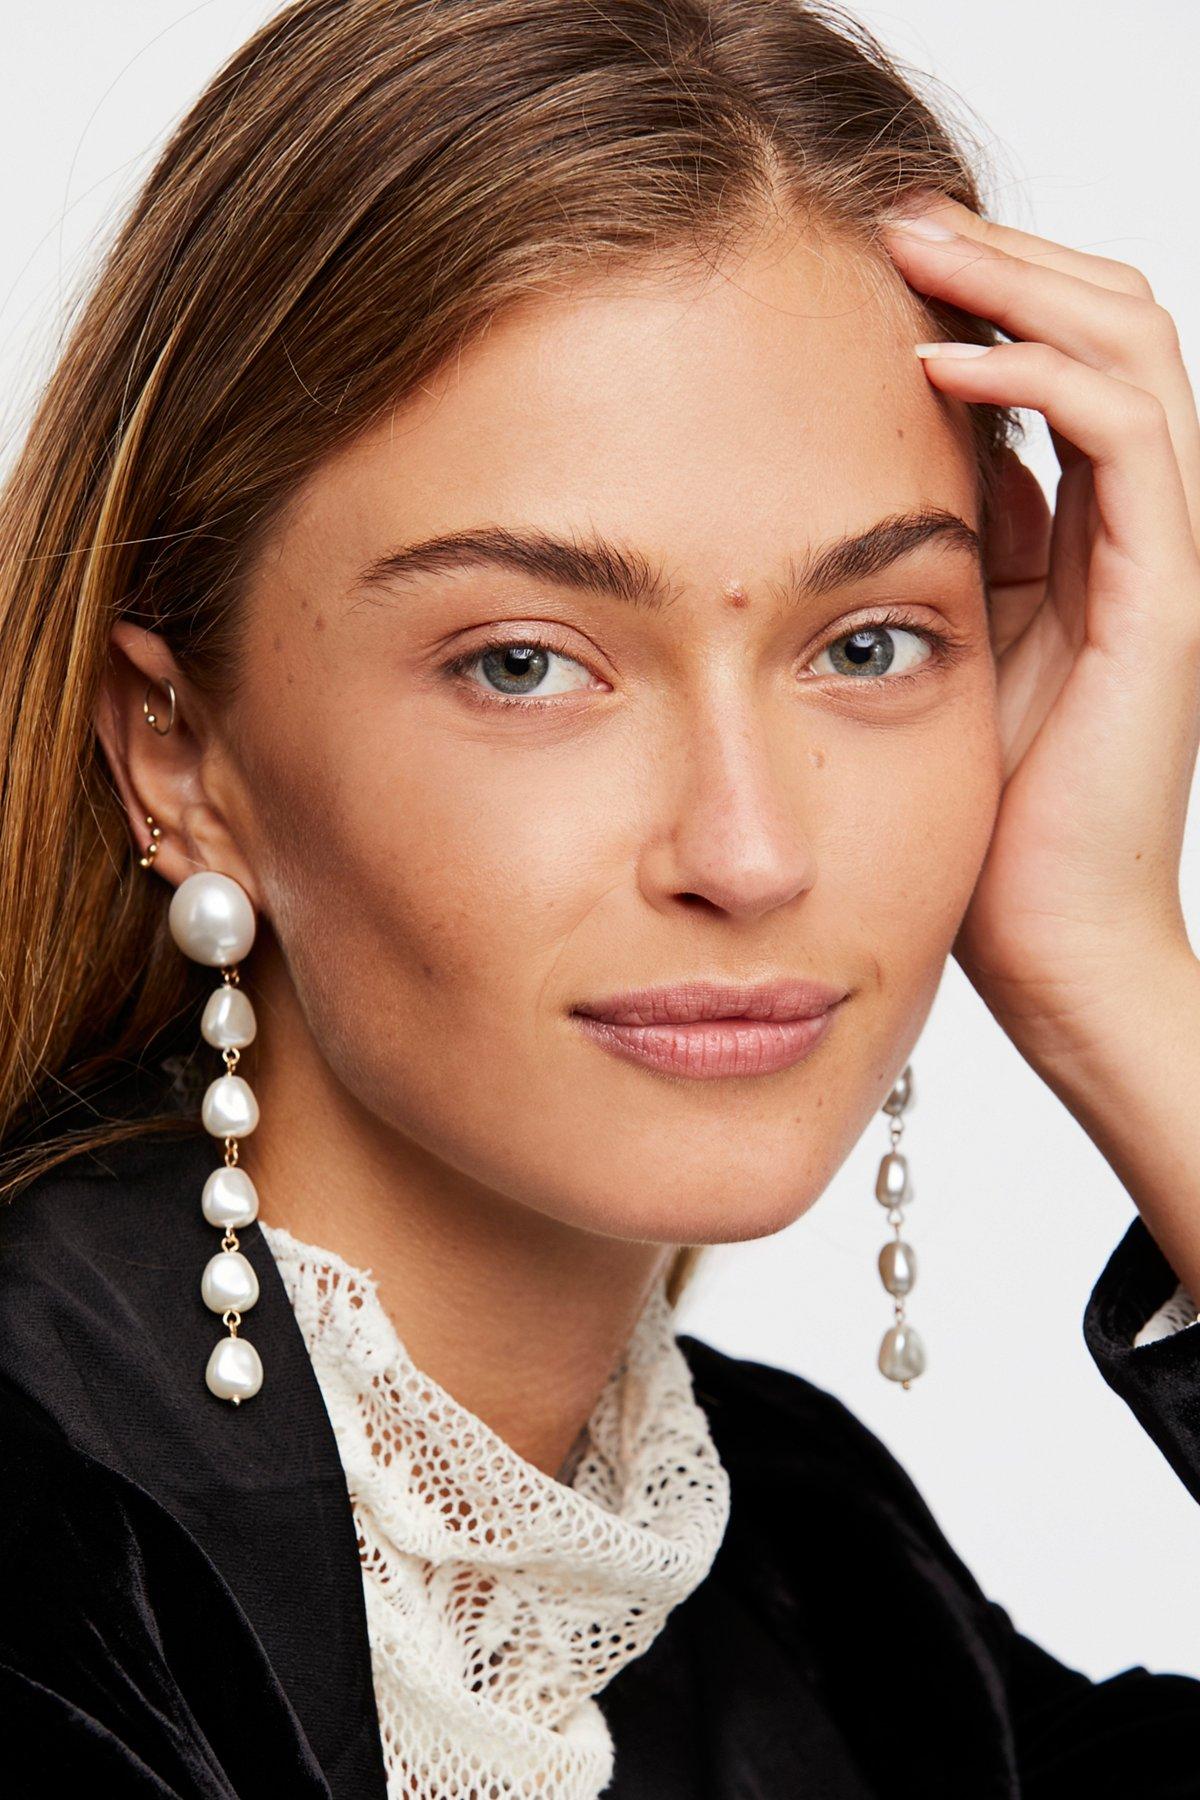 Pretty in Pearls吊坠耳环